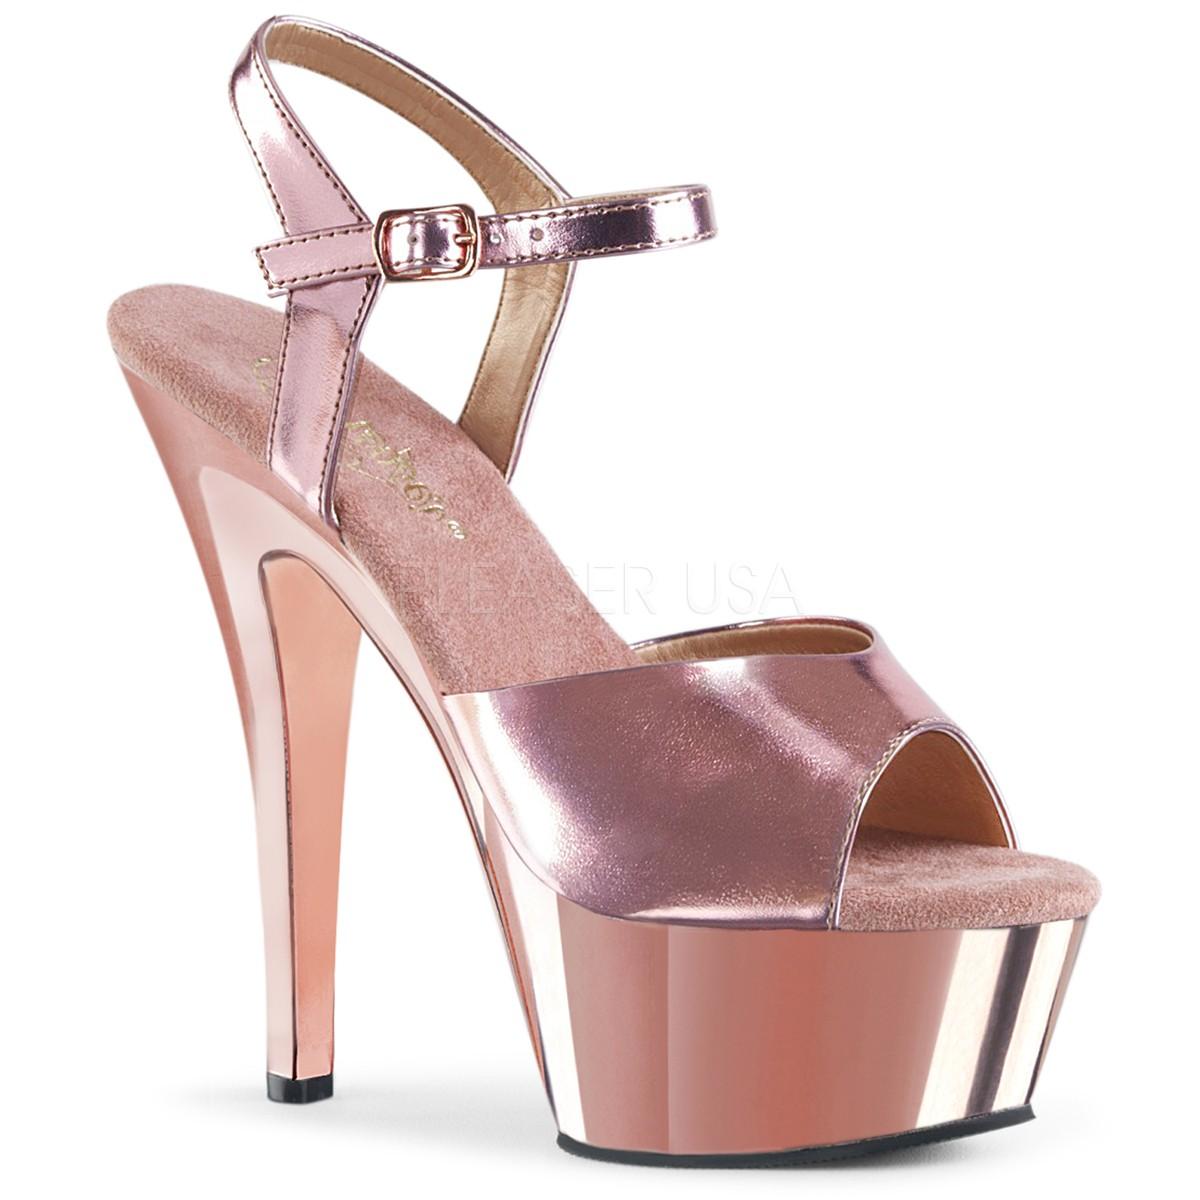 209 Tacón Plataforma Zapatos Kiss 3qaj54lr Cm Aguja Cobre 15 QsrhCdt